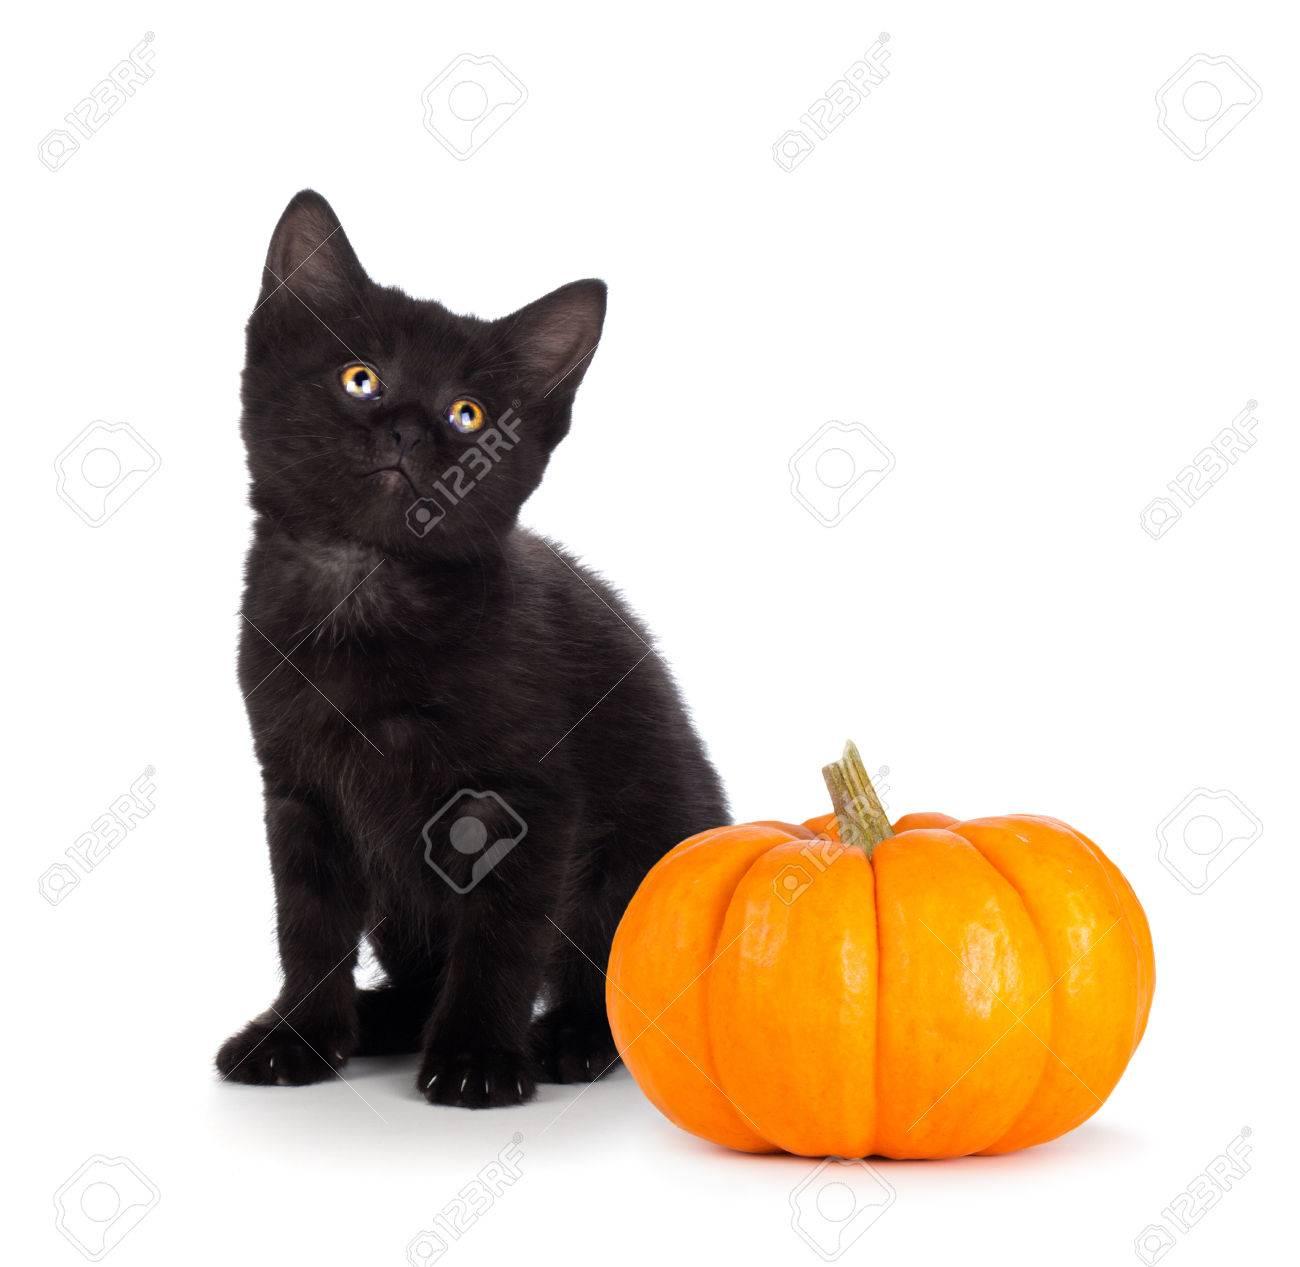 Cute Black Kitten Next To A Mini Pumpkin Isolated White Stock